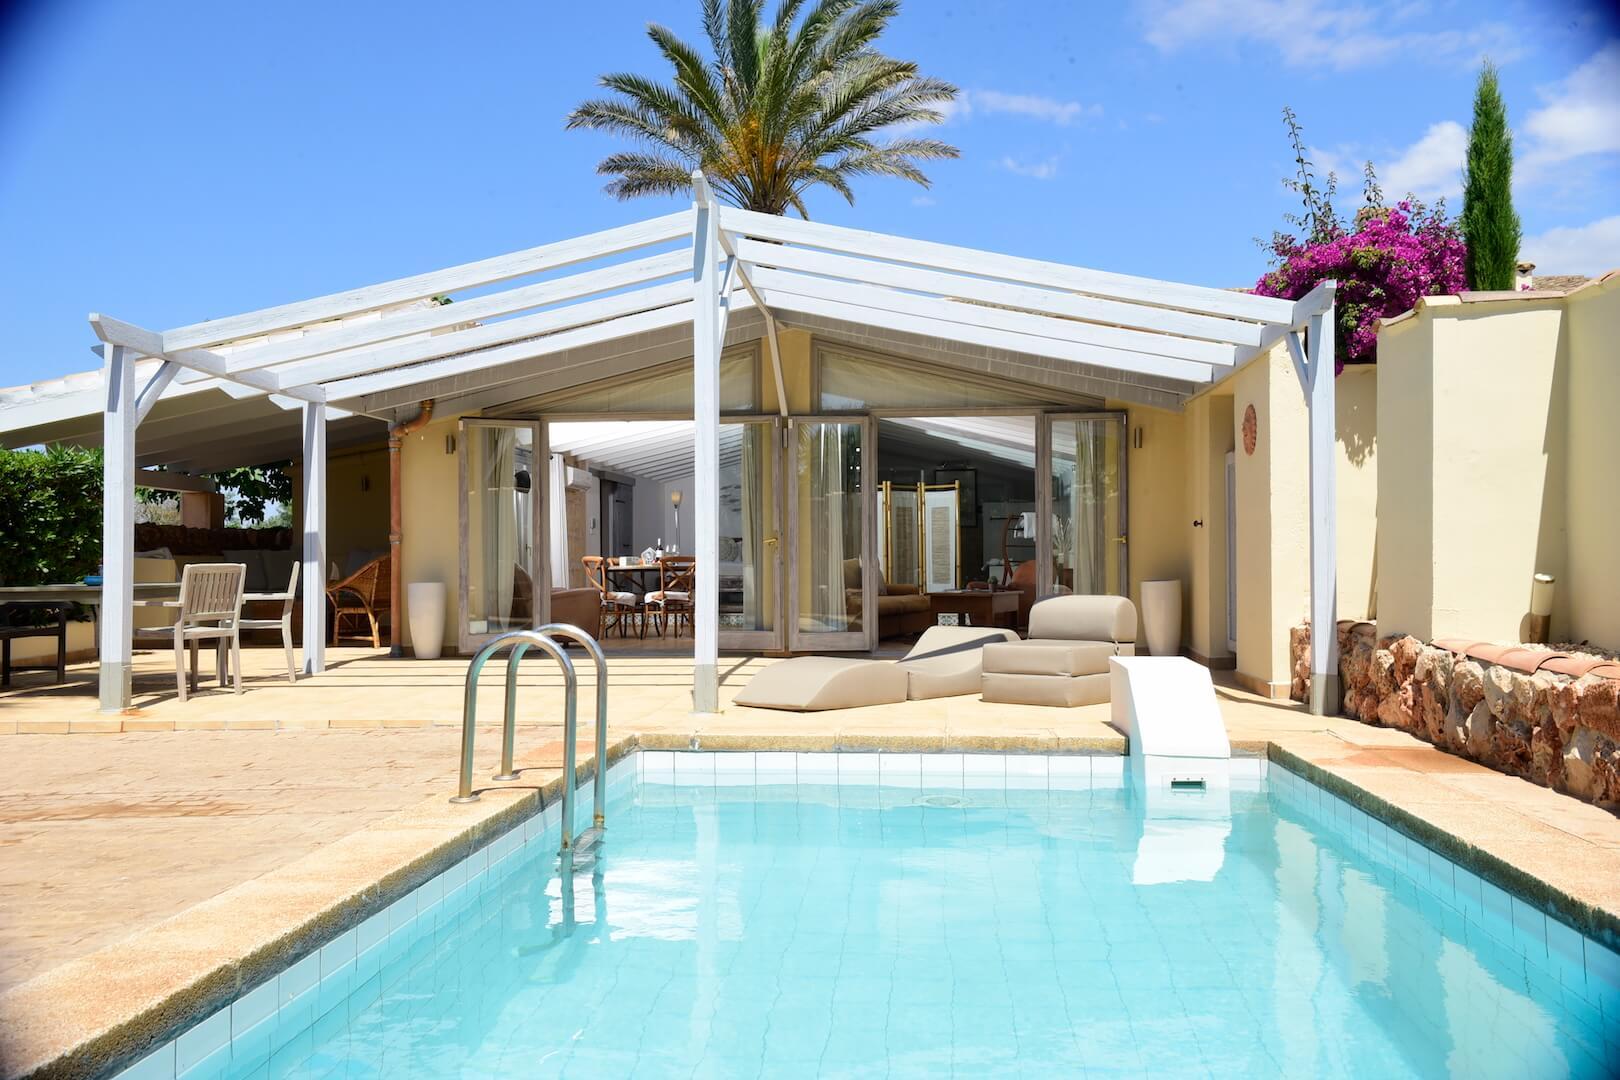 ISLA-Travel-Casa Amapola aussen3 (1)